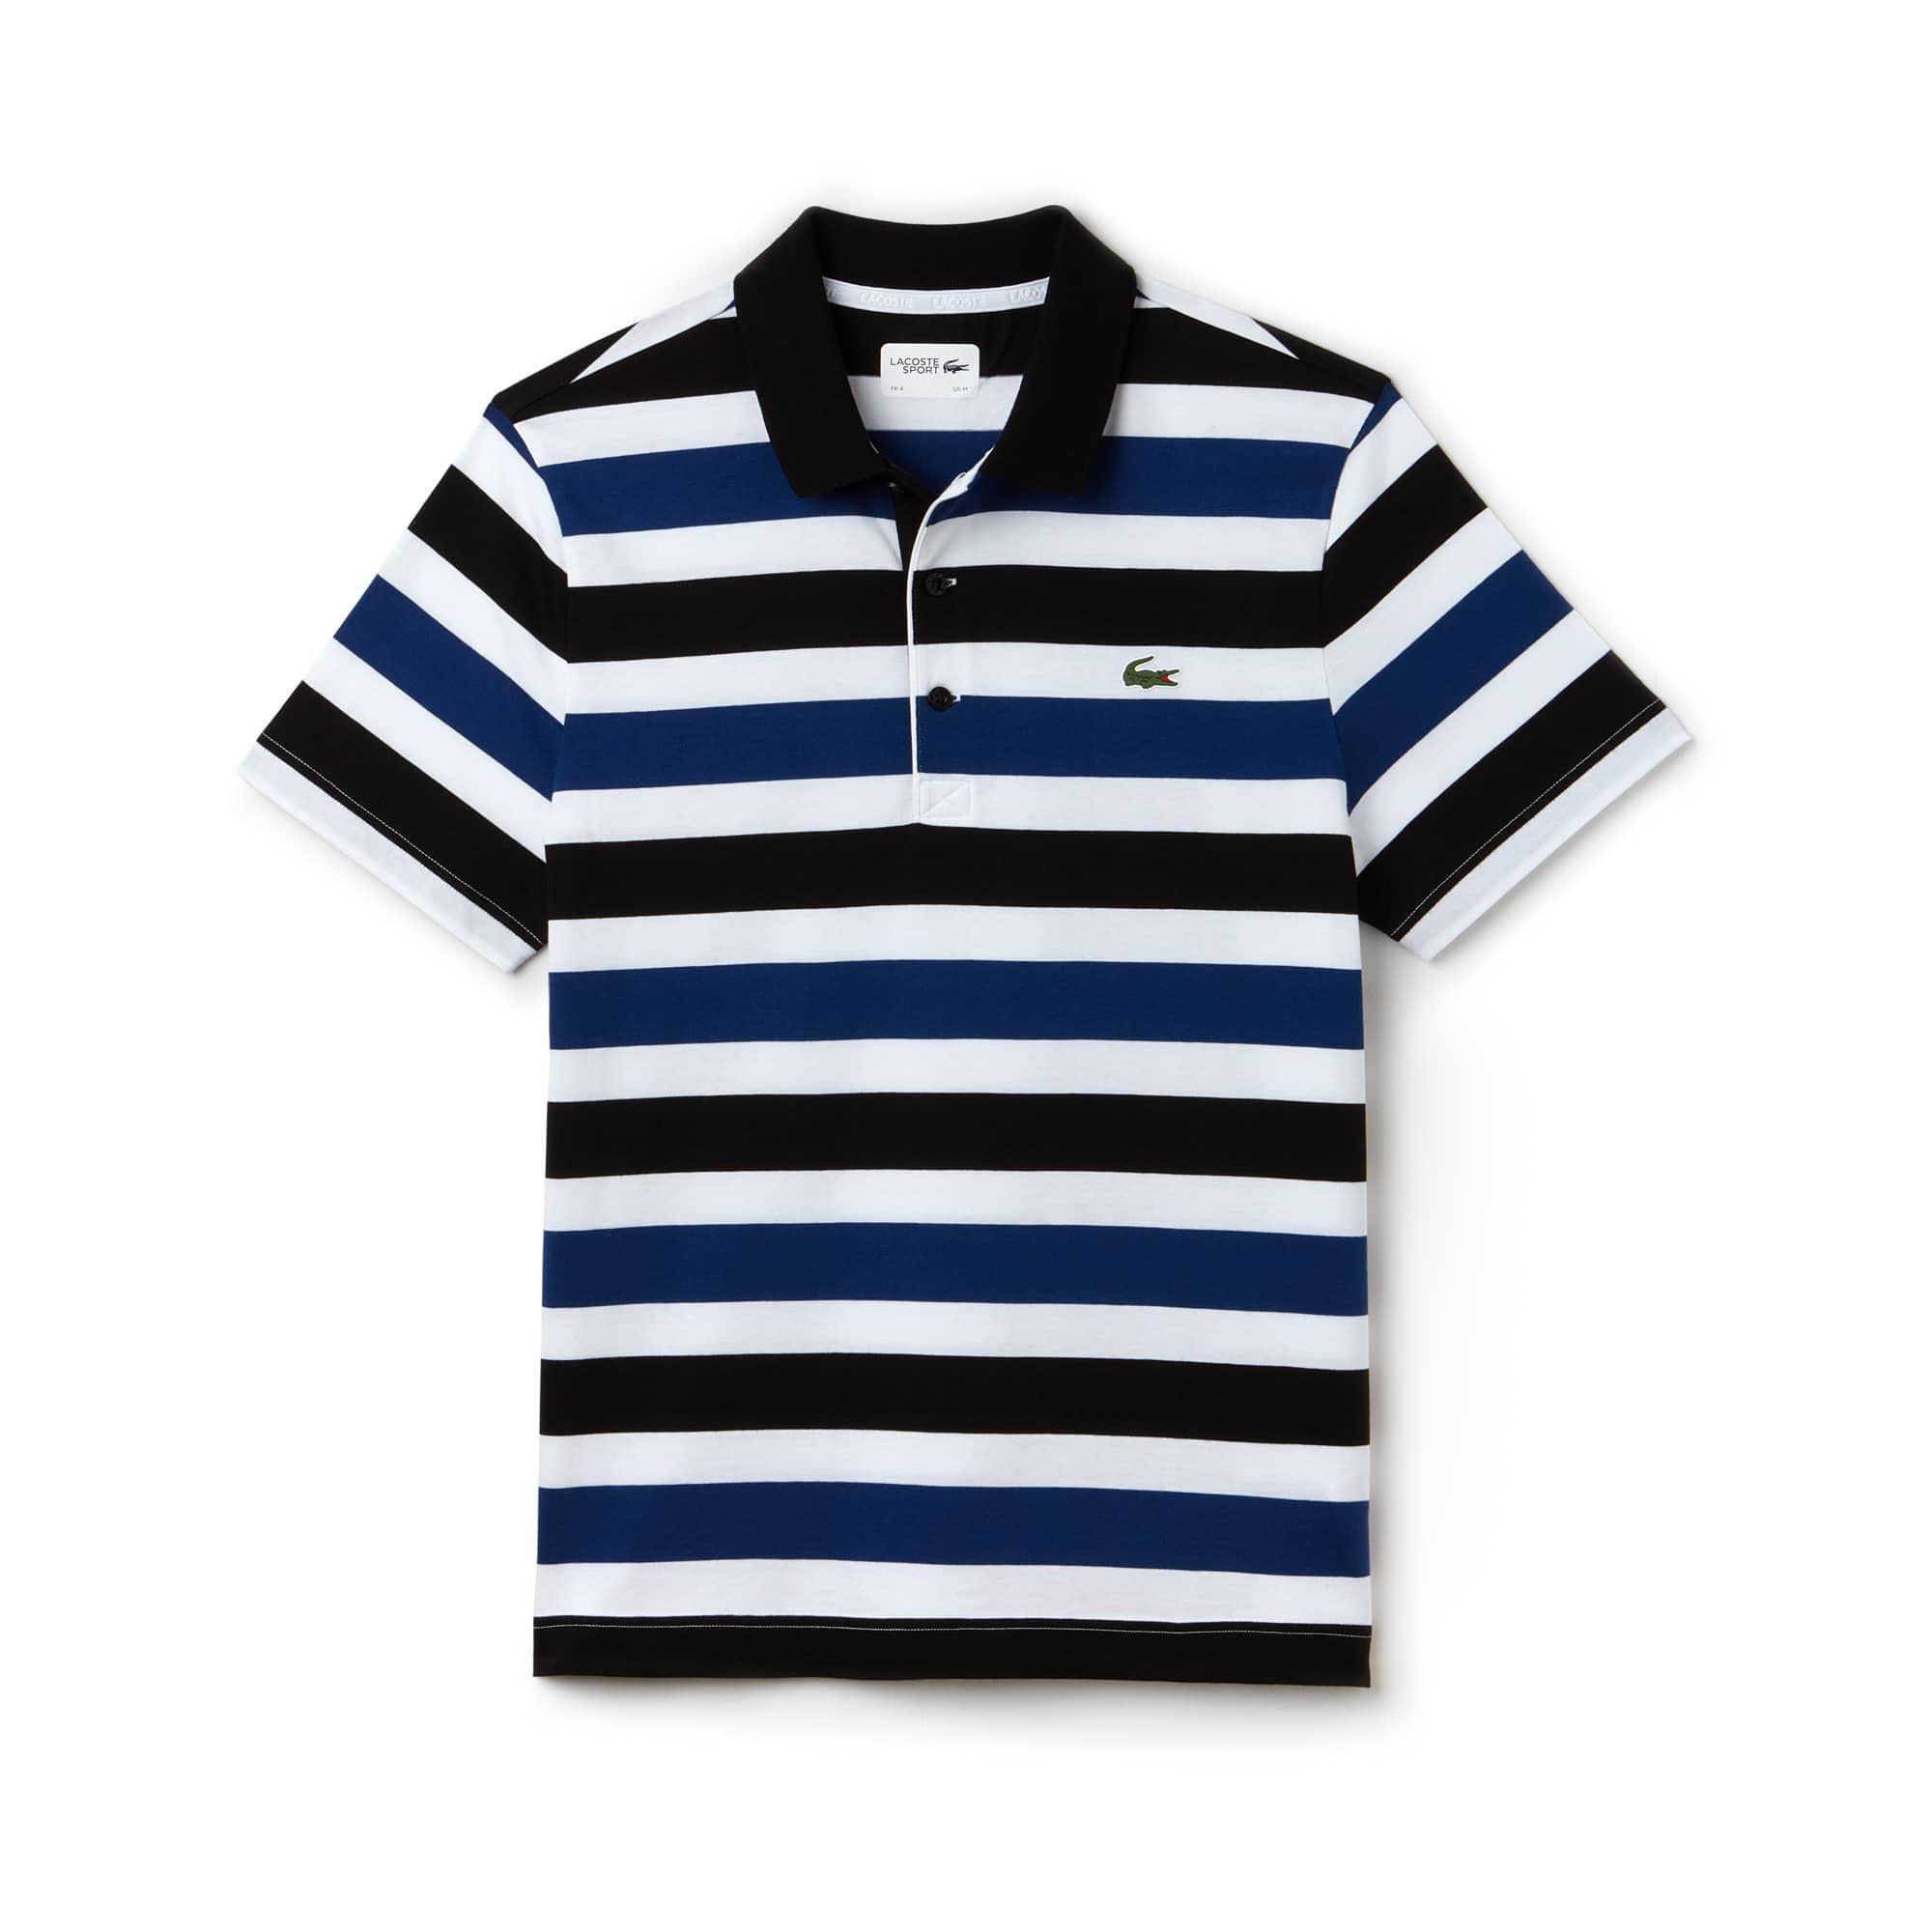 Herren LACOSTE SPORT gestreiftes Tennis-Poloshirt